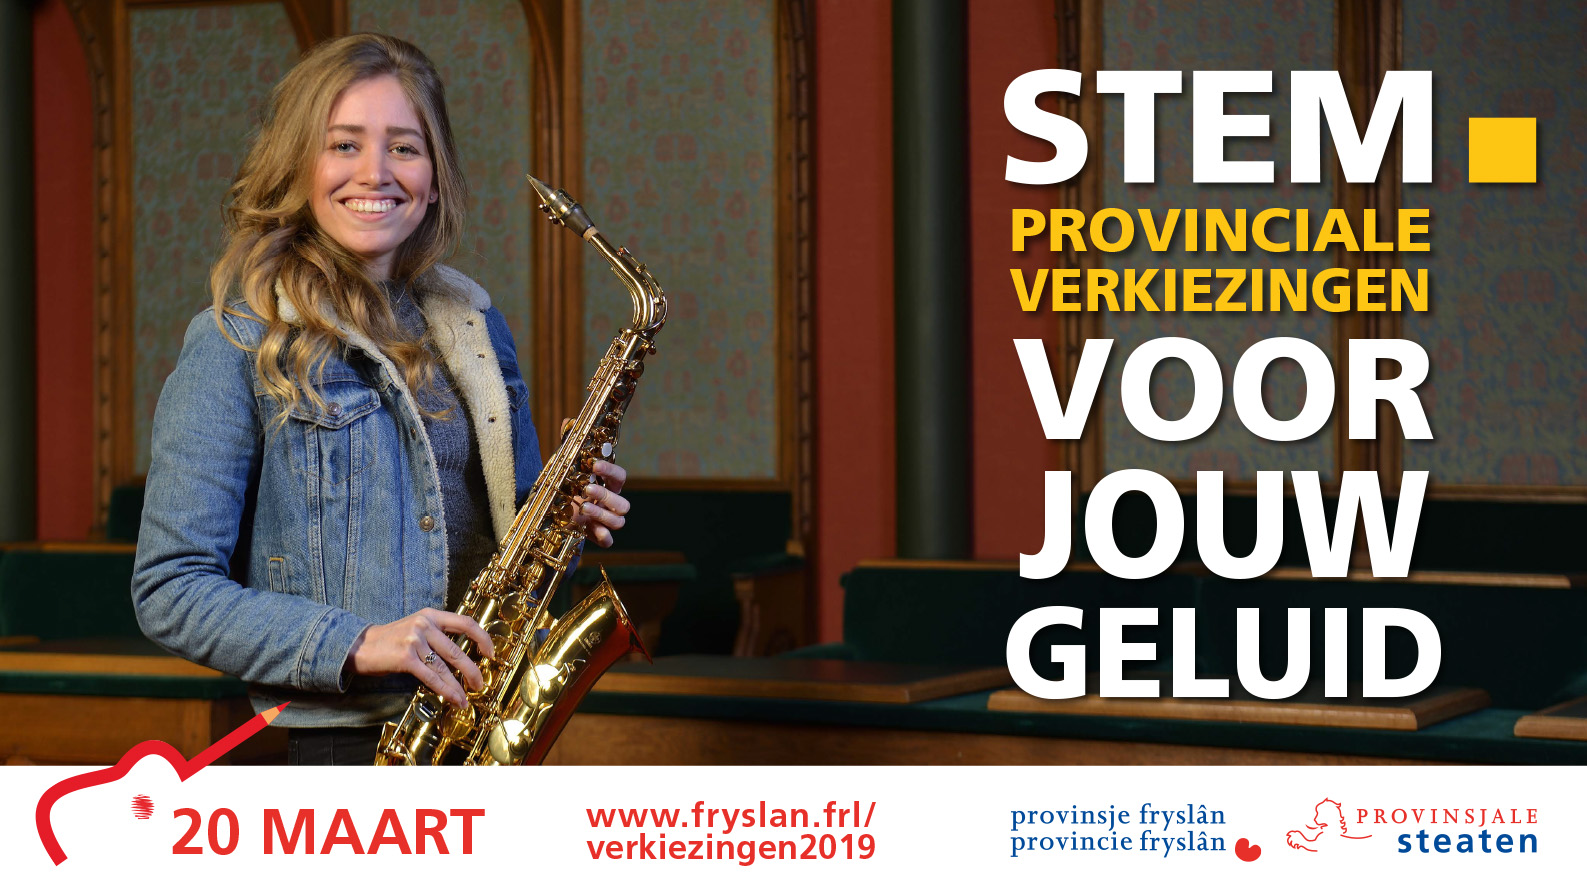 Campagne-site provincie Fryslân